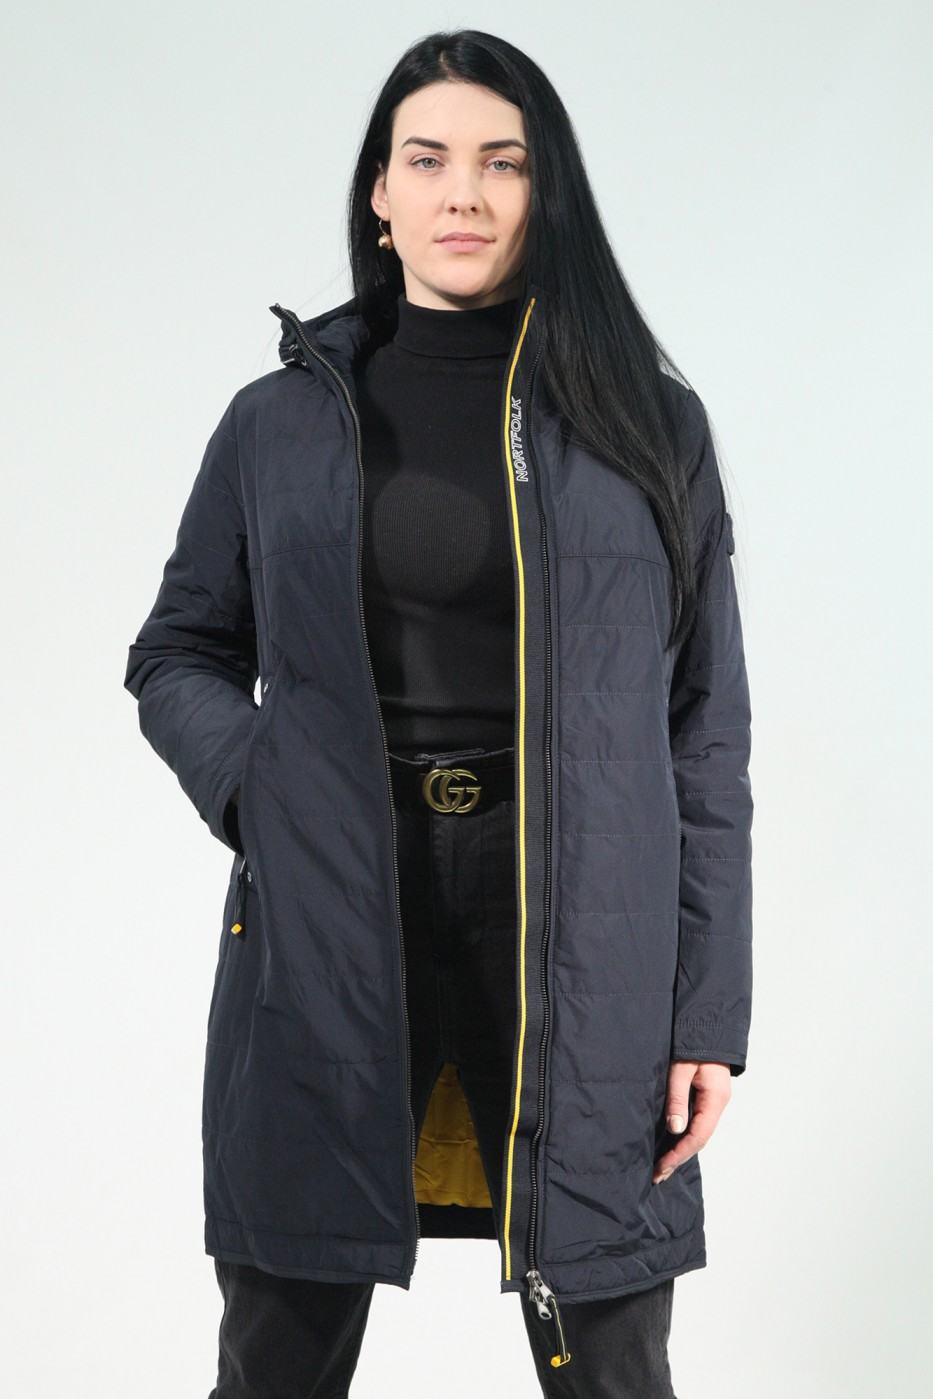 Тёмно-синяя женская зимняя куртка 731360N15N ЦВ.200